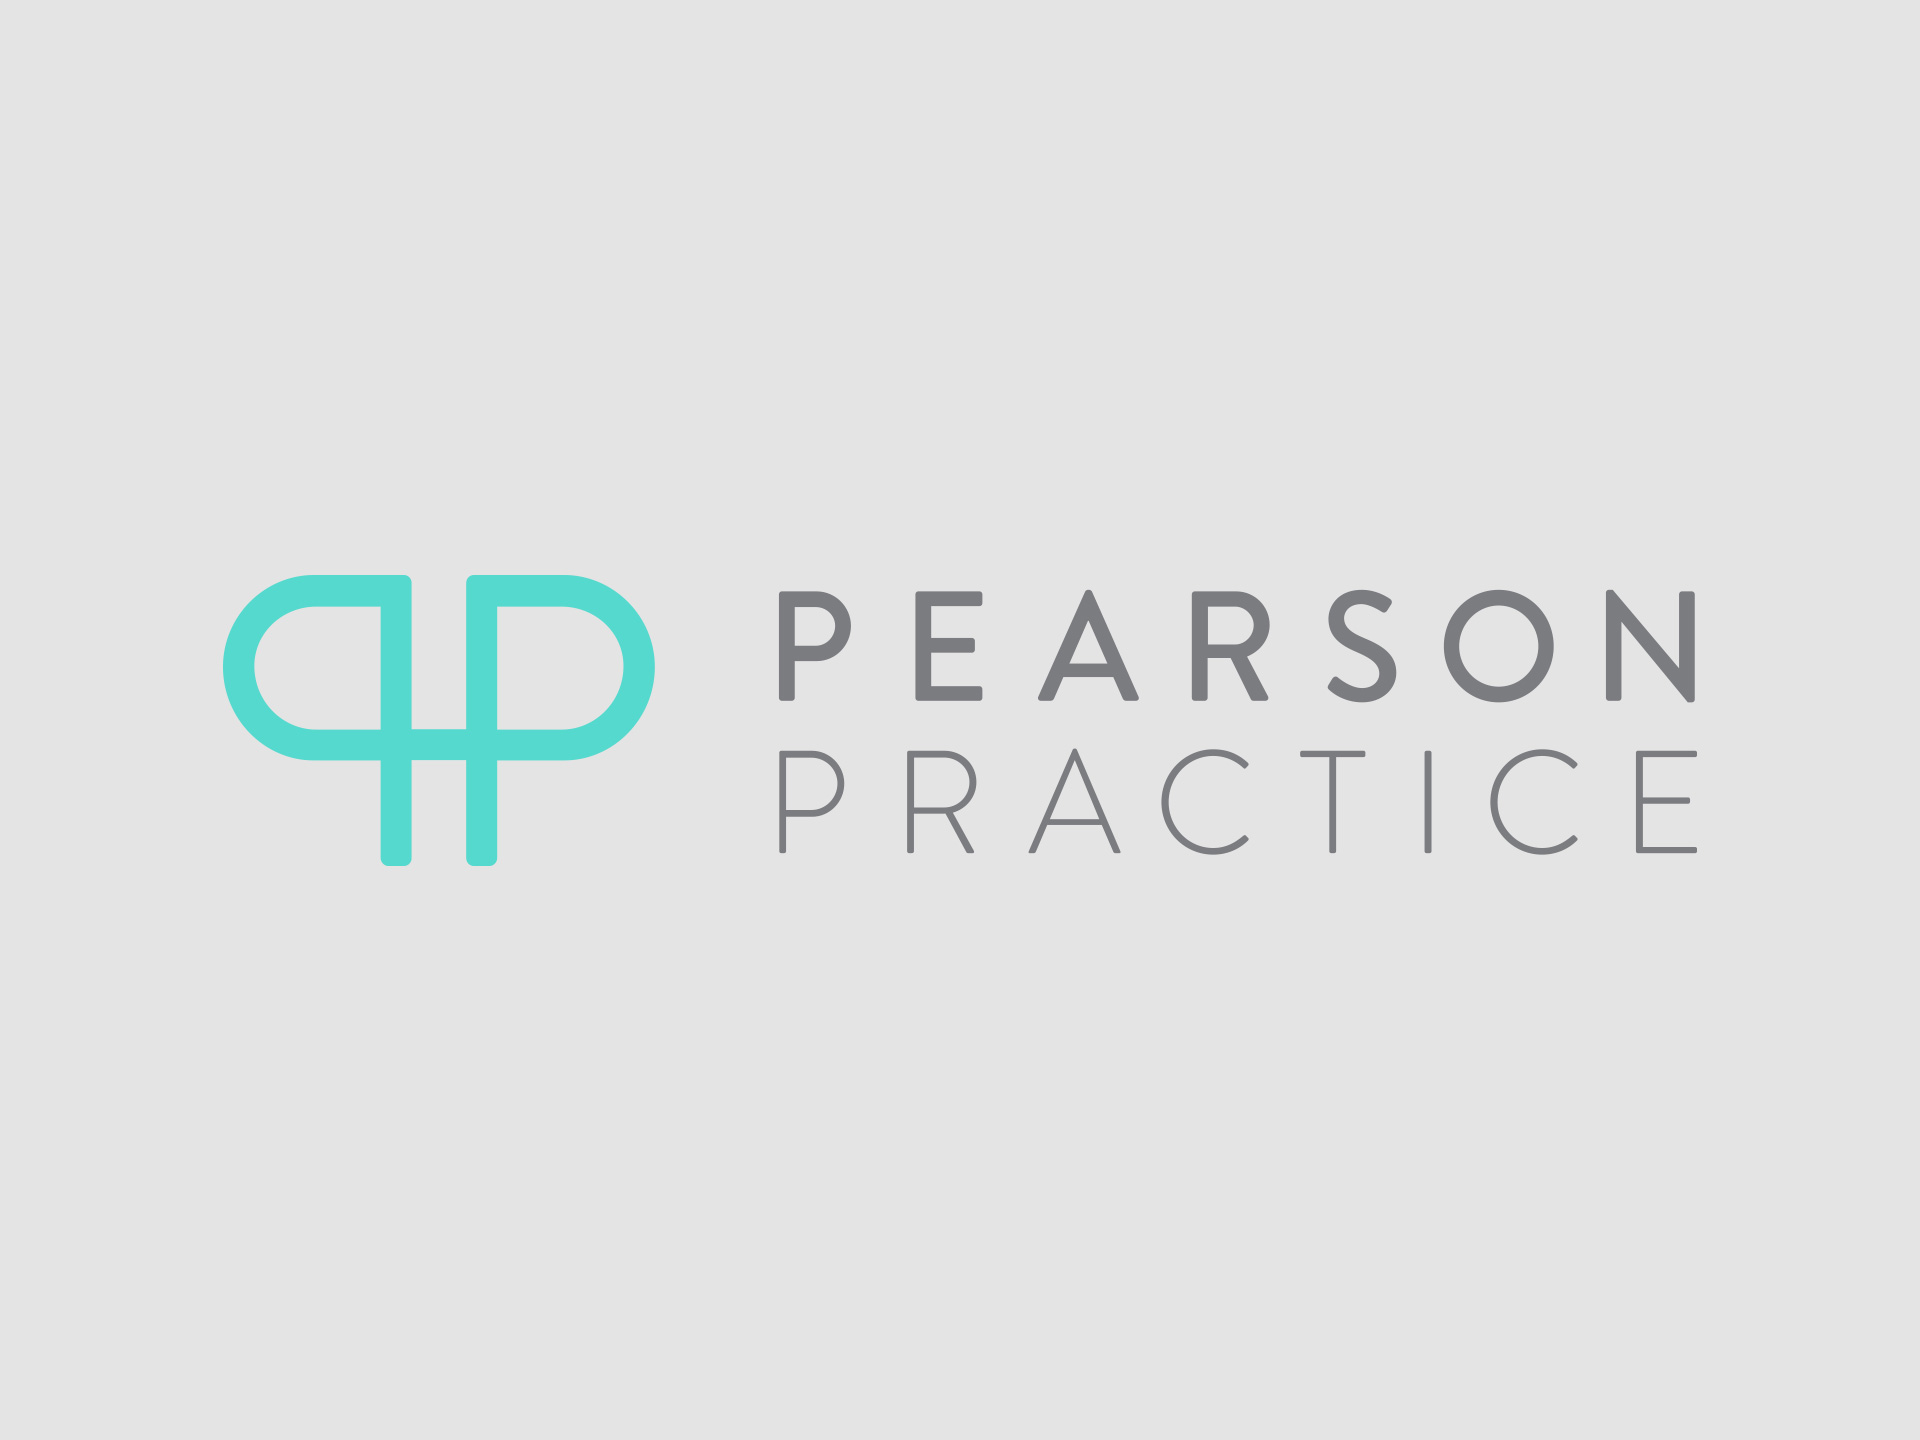 Pearson Practice Brand Identity